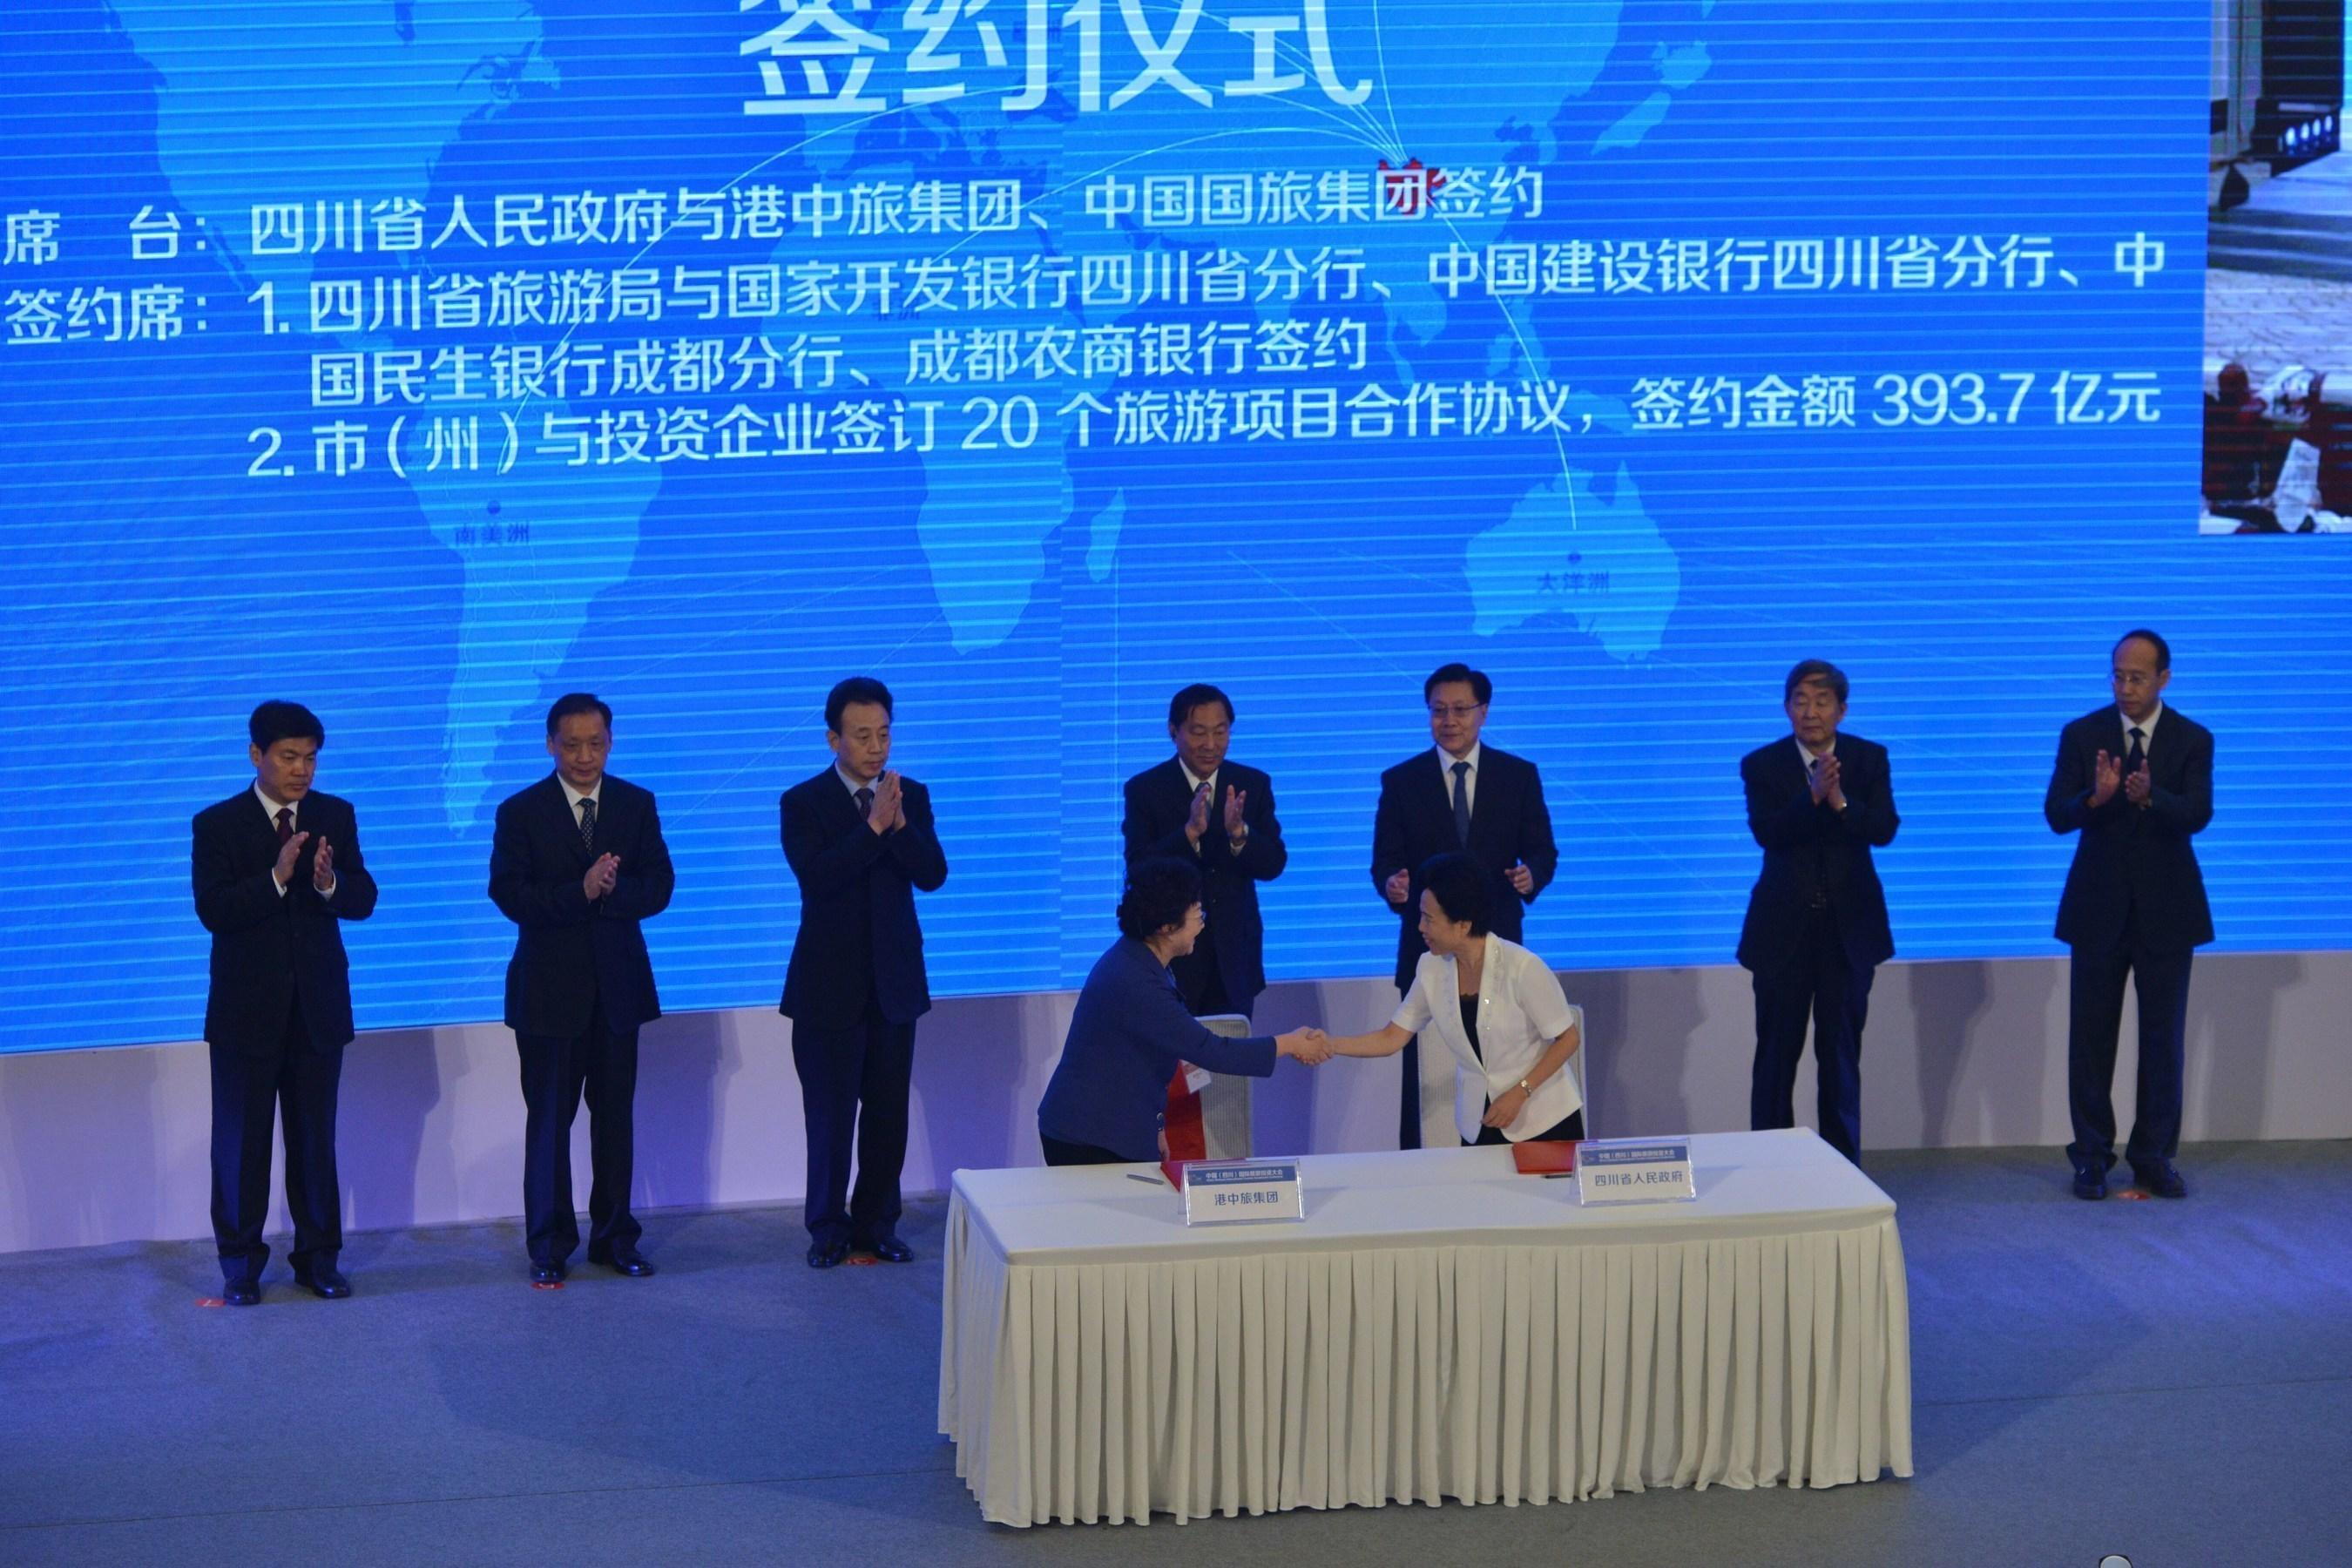 China (Sichuan) International Tourism Investment Conference in Chengdu abgehalten